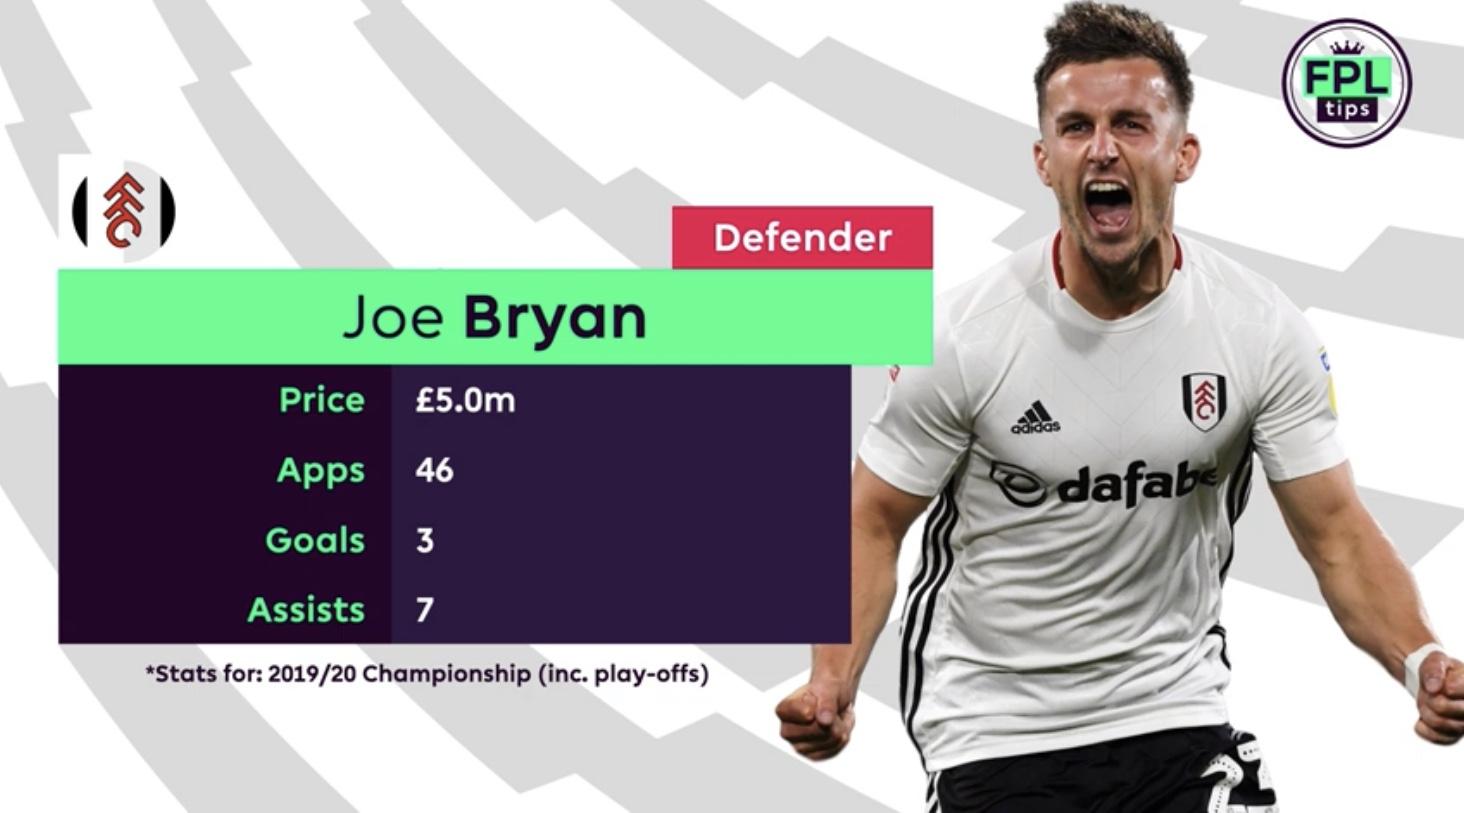 Joe Bryan Fulham FC - FPL Tips